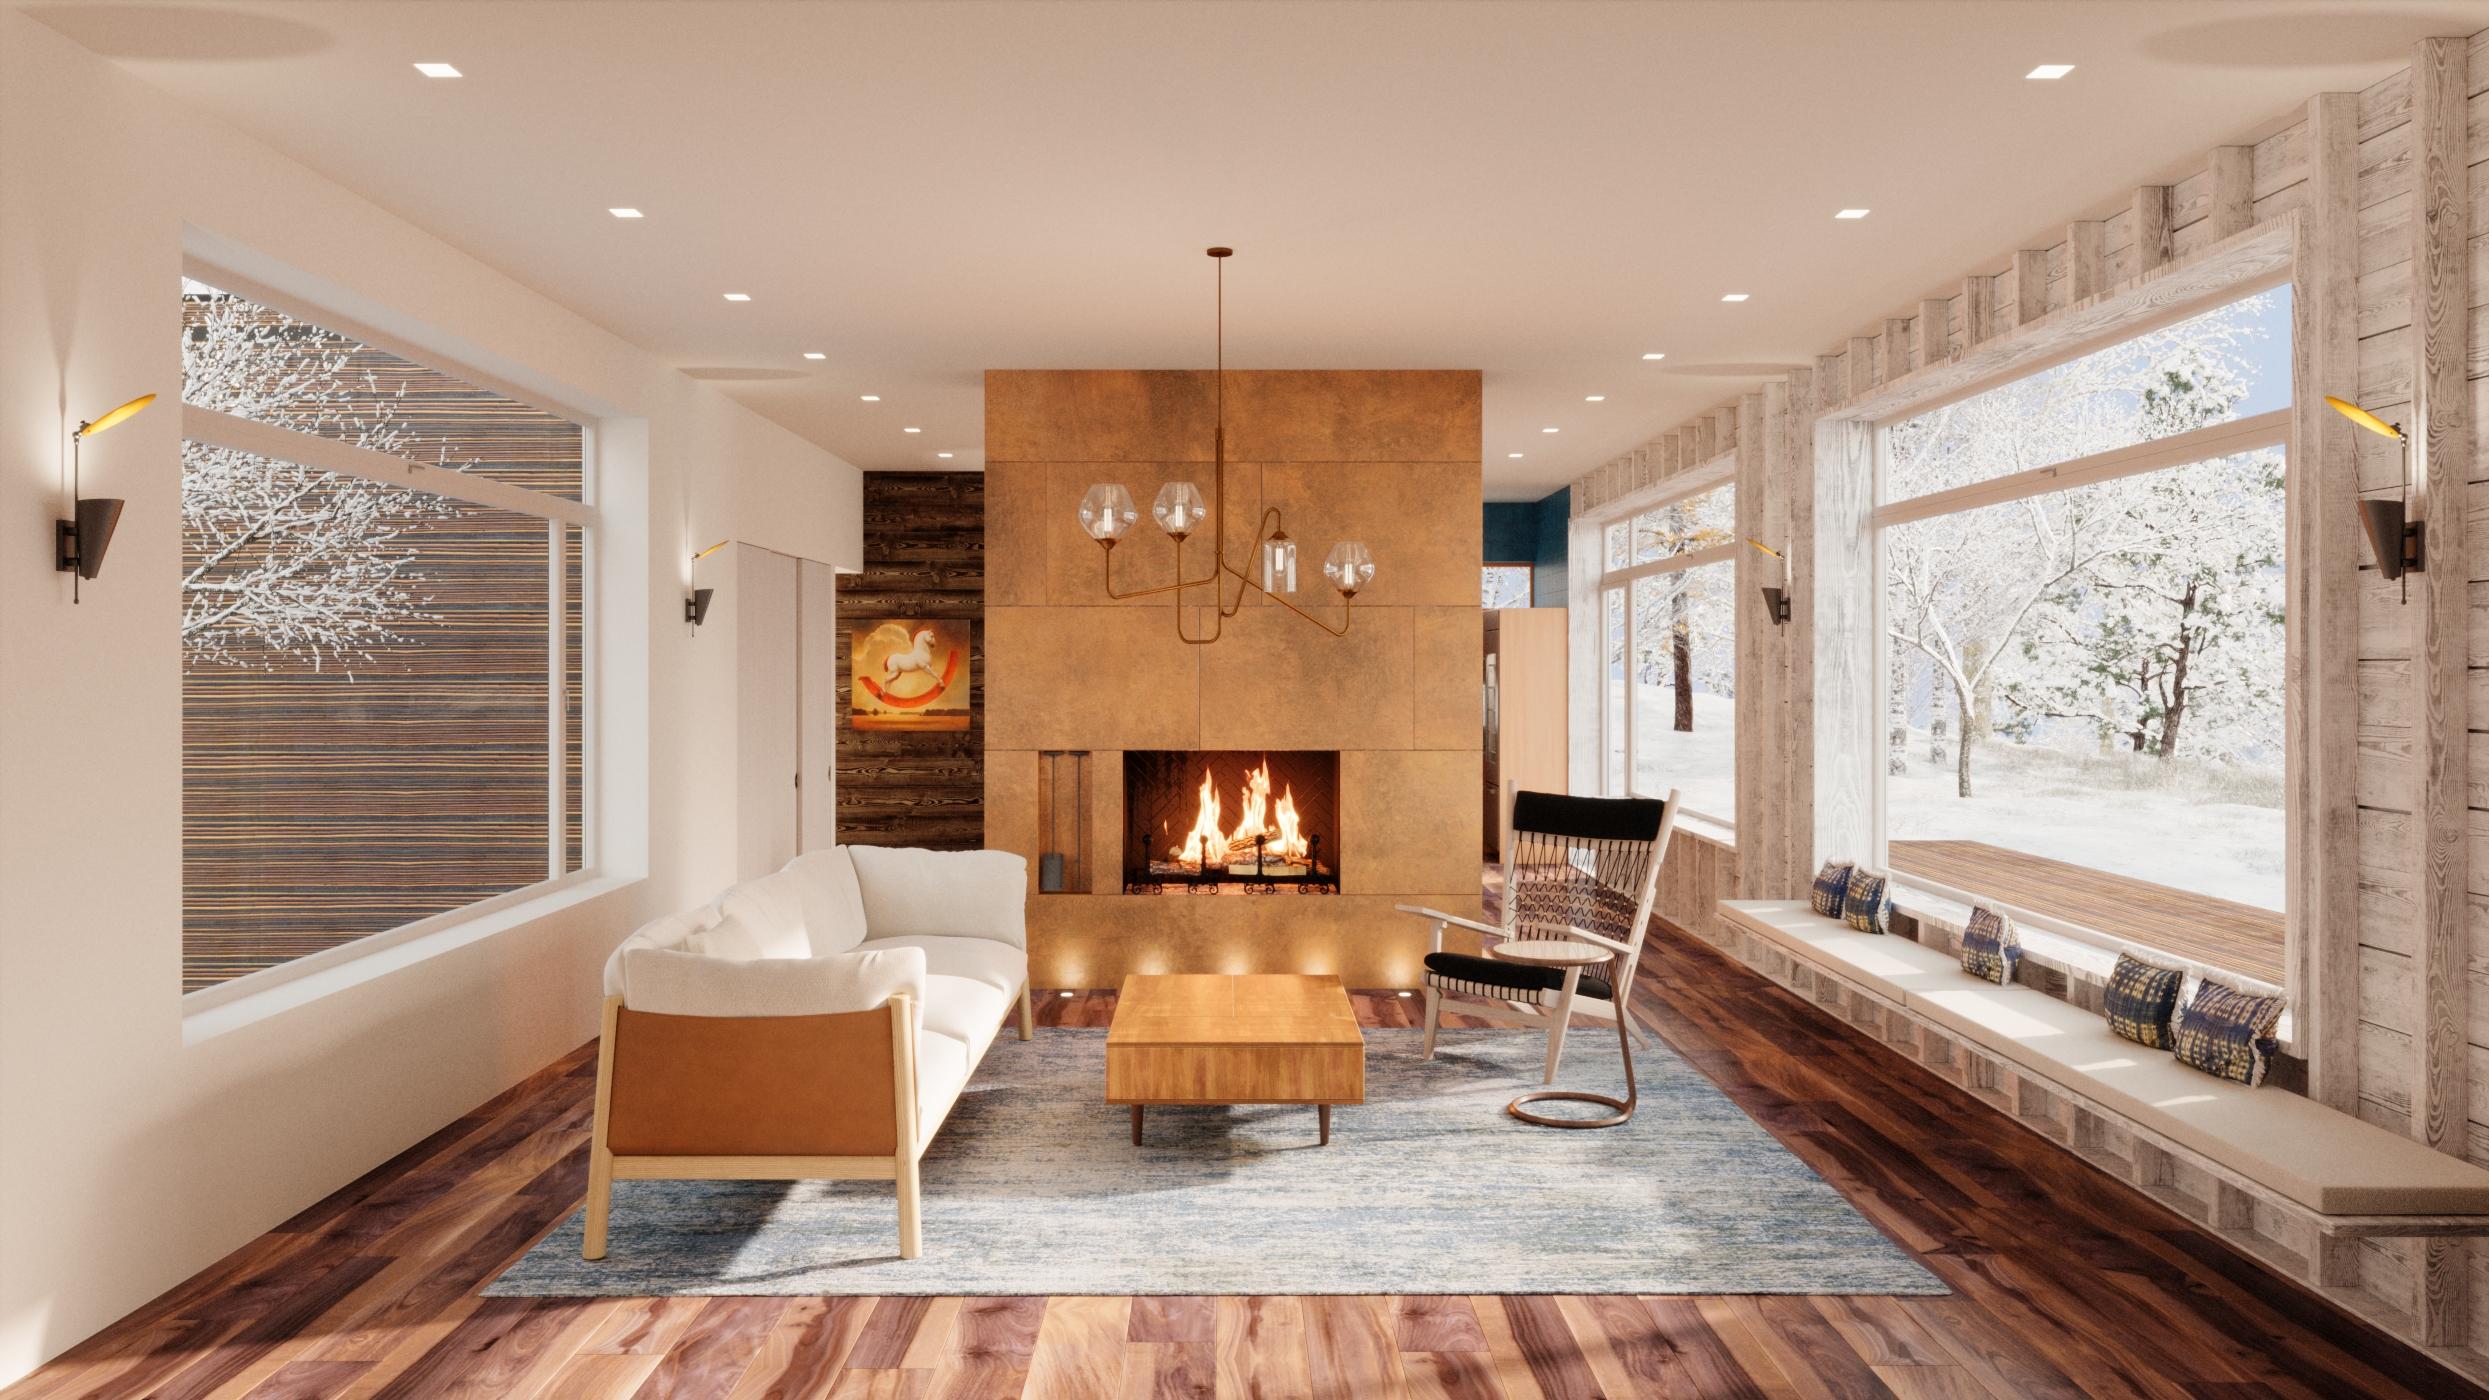 RDD HOUSE:  INTERIOR DESIGN